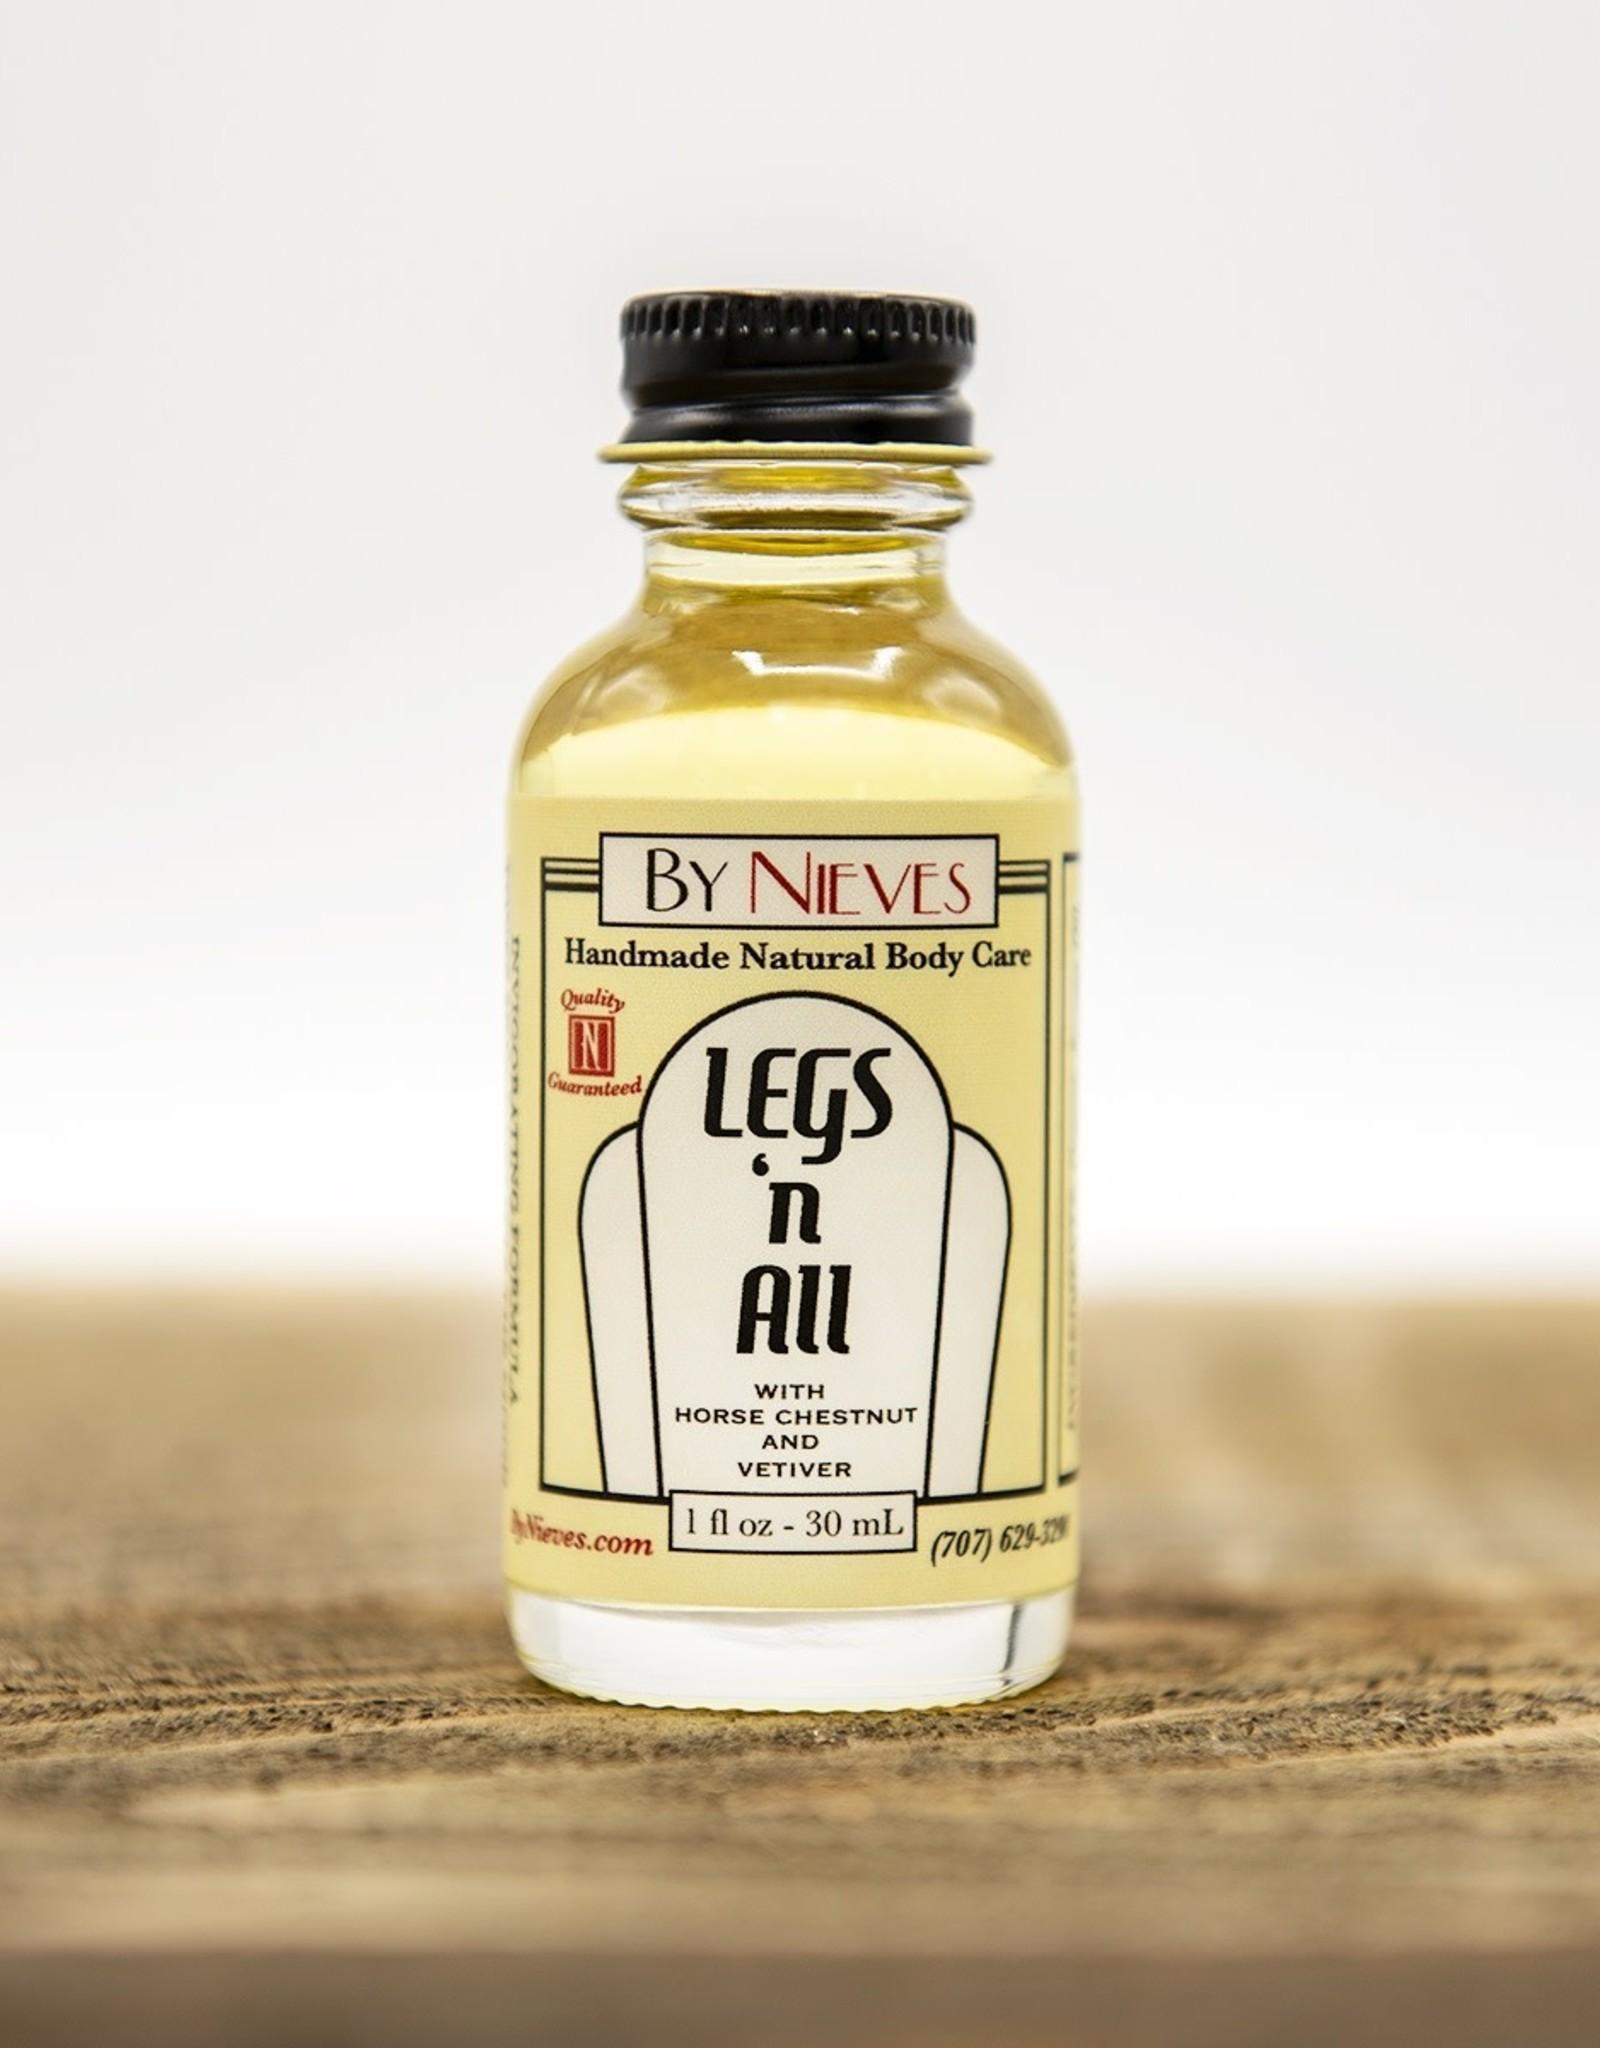 LEGS N ALL 1OZ BOTTLE TRIAL